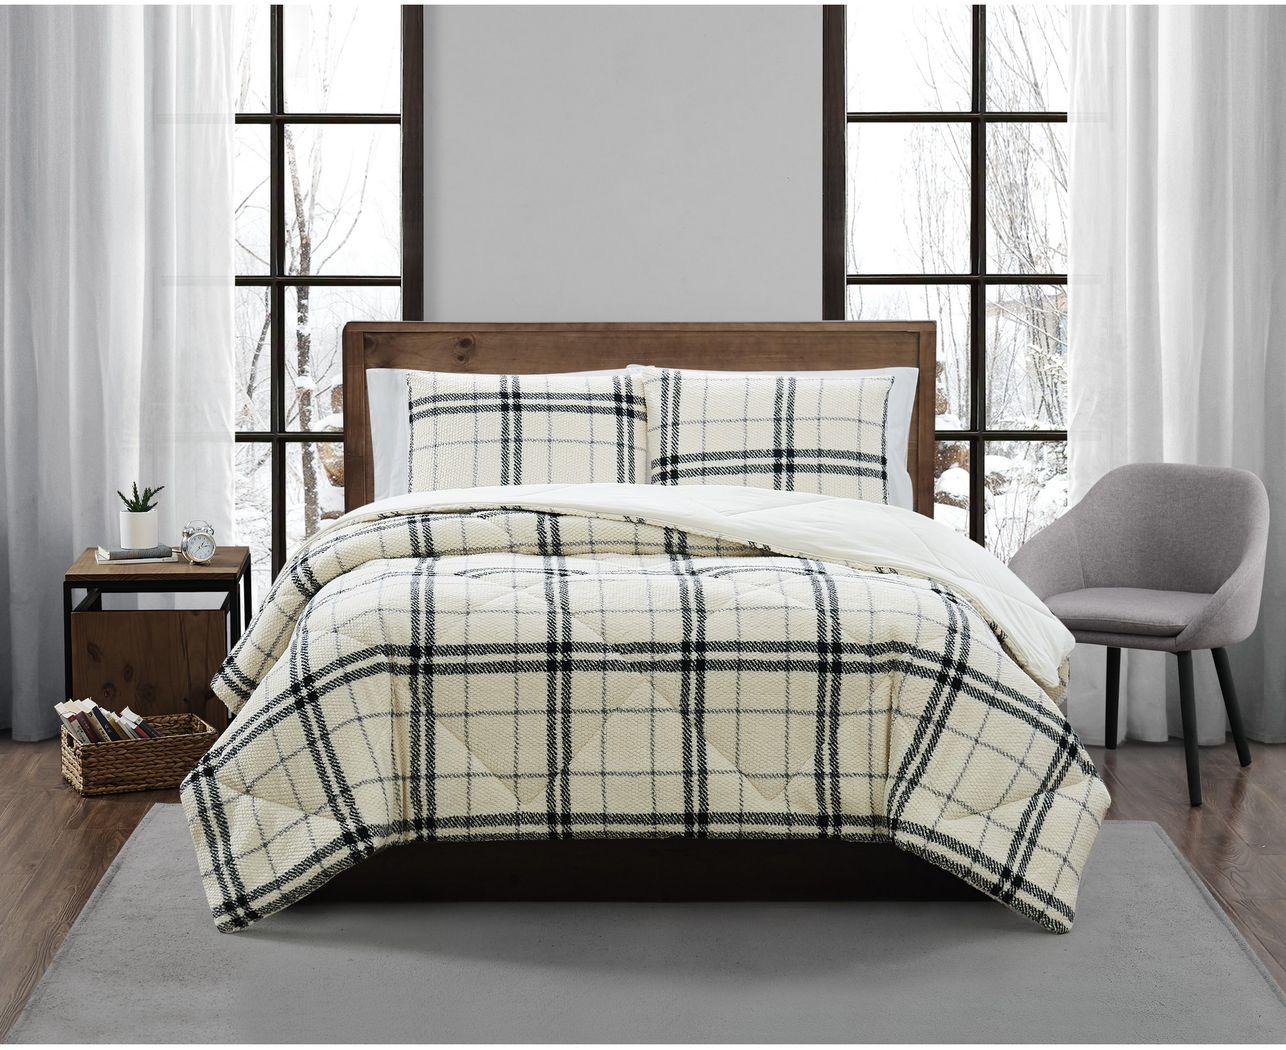 Kids Urban Cabin Charcoal 2 Pc Twin XL Comforter Set